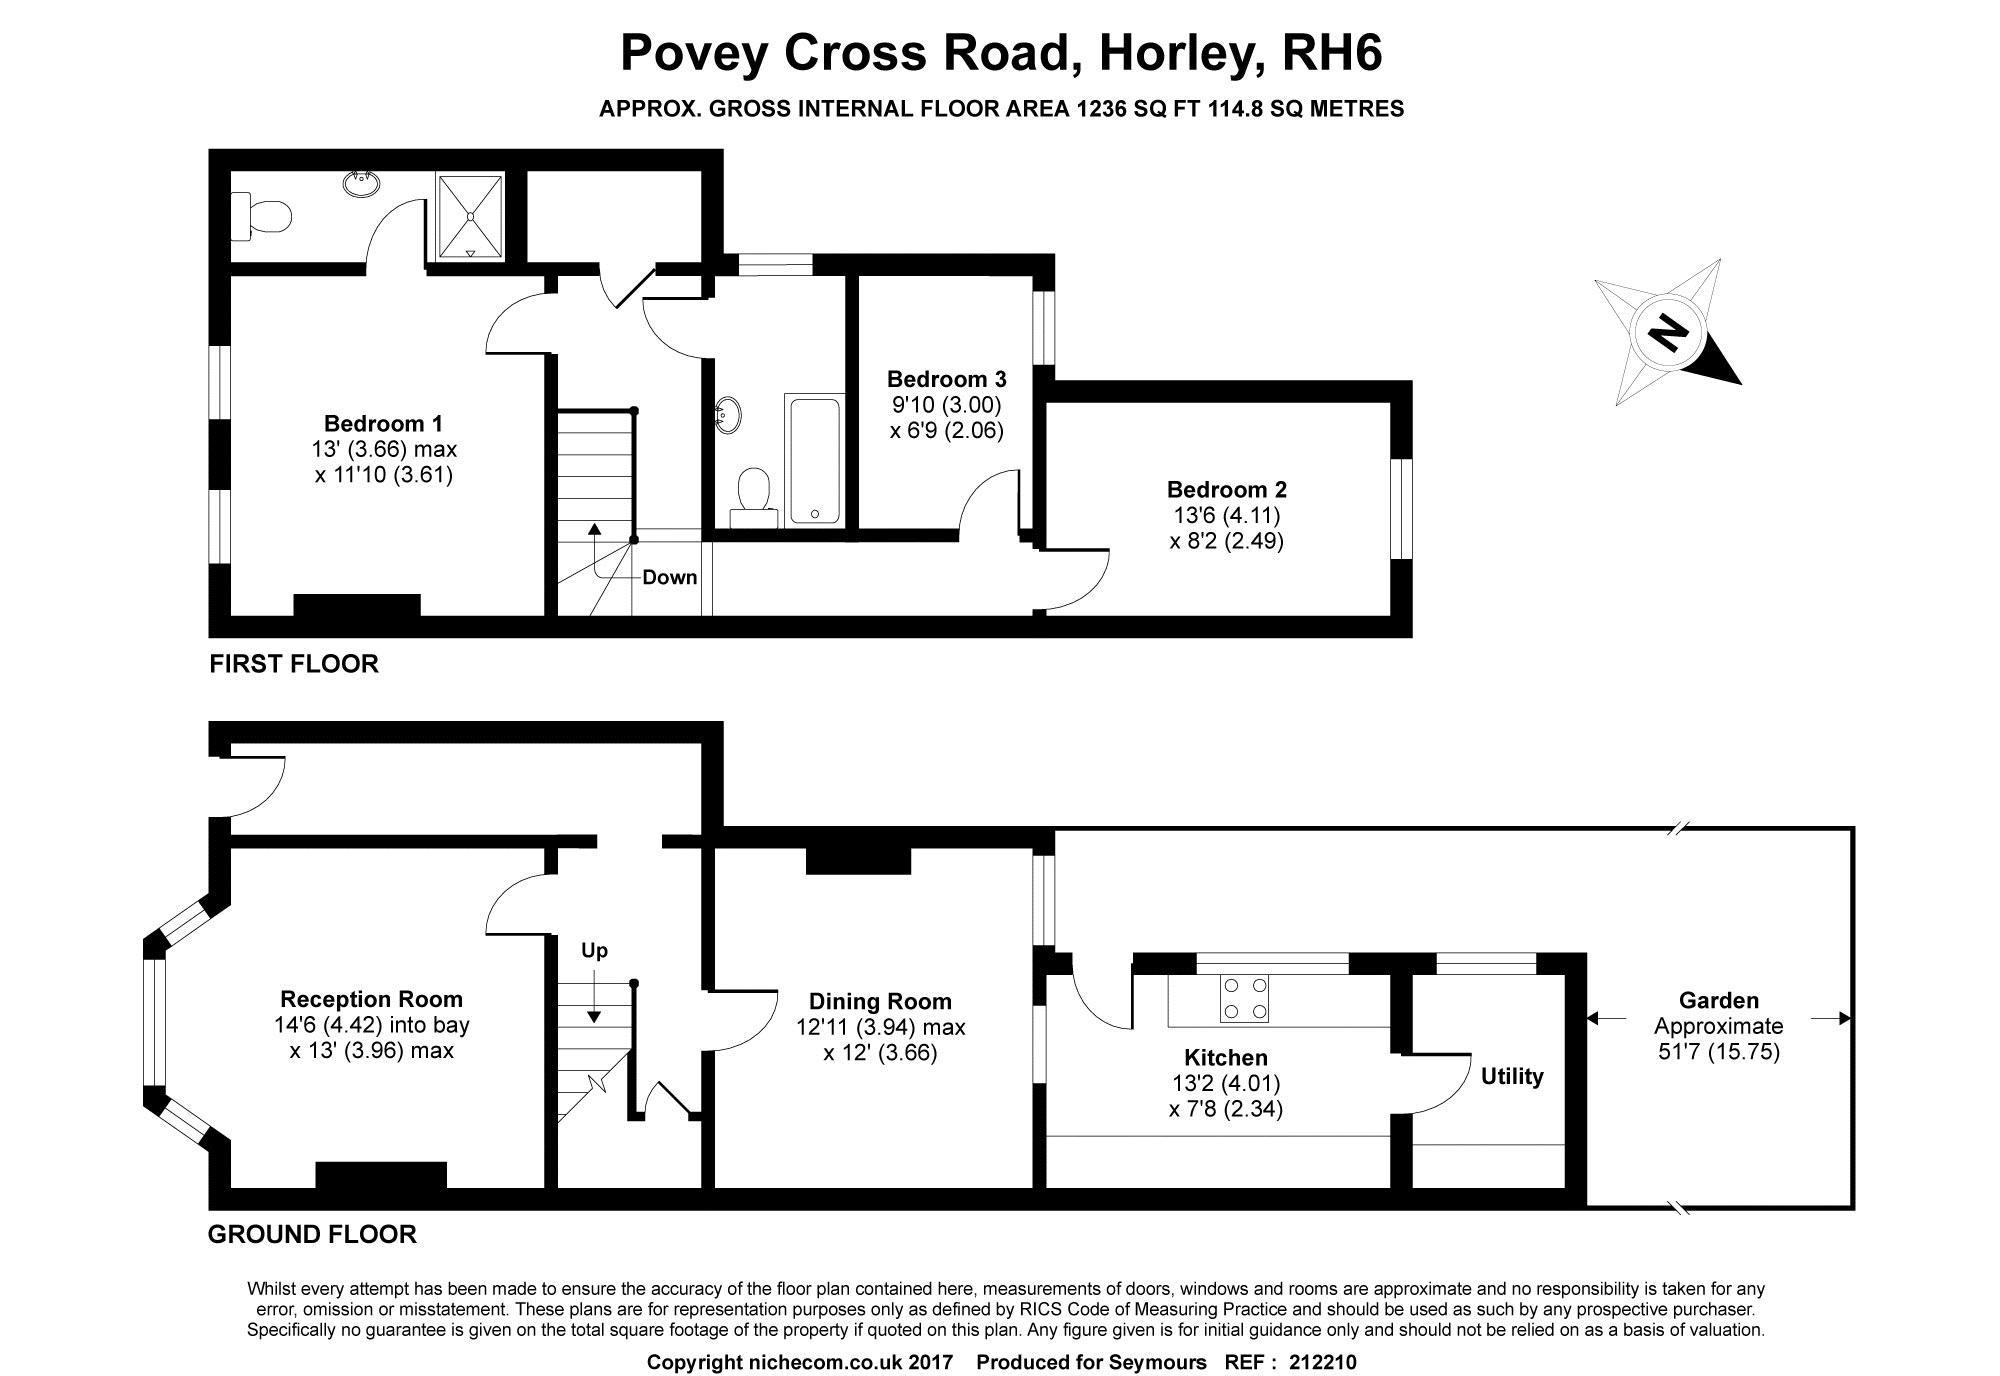 3 Bedroom Property For Sale In Horley